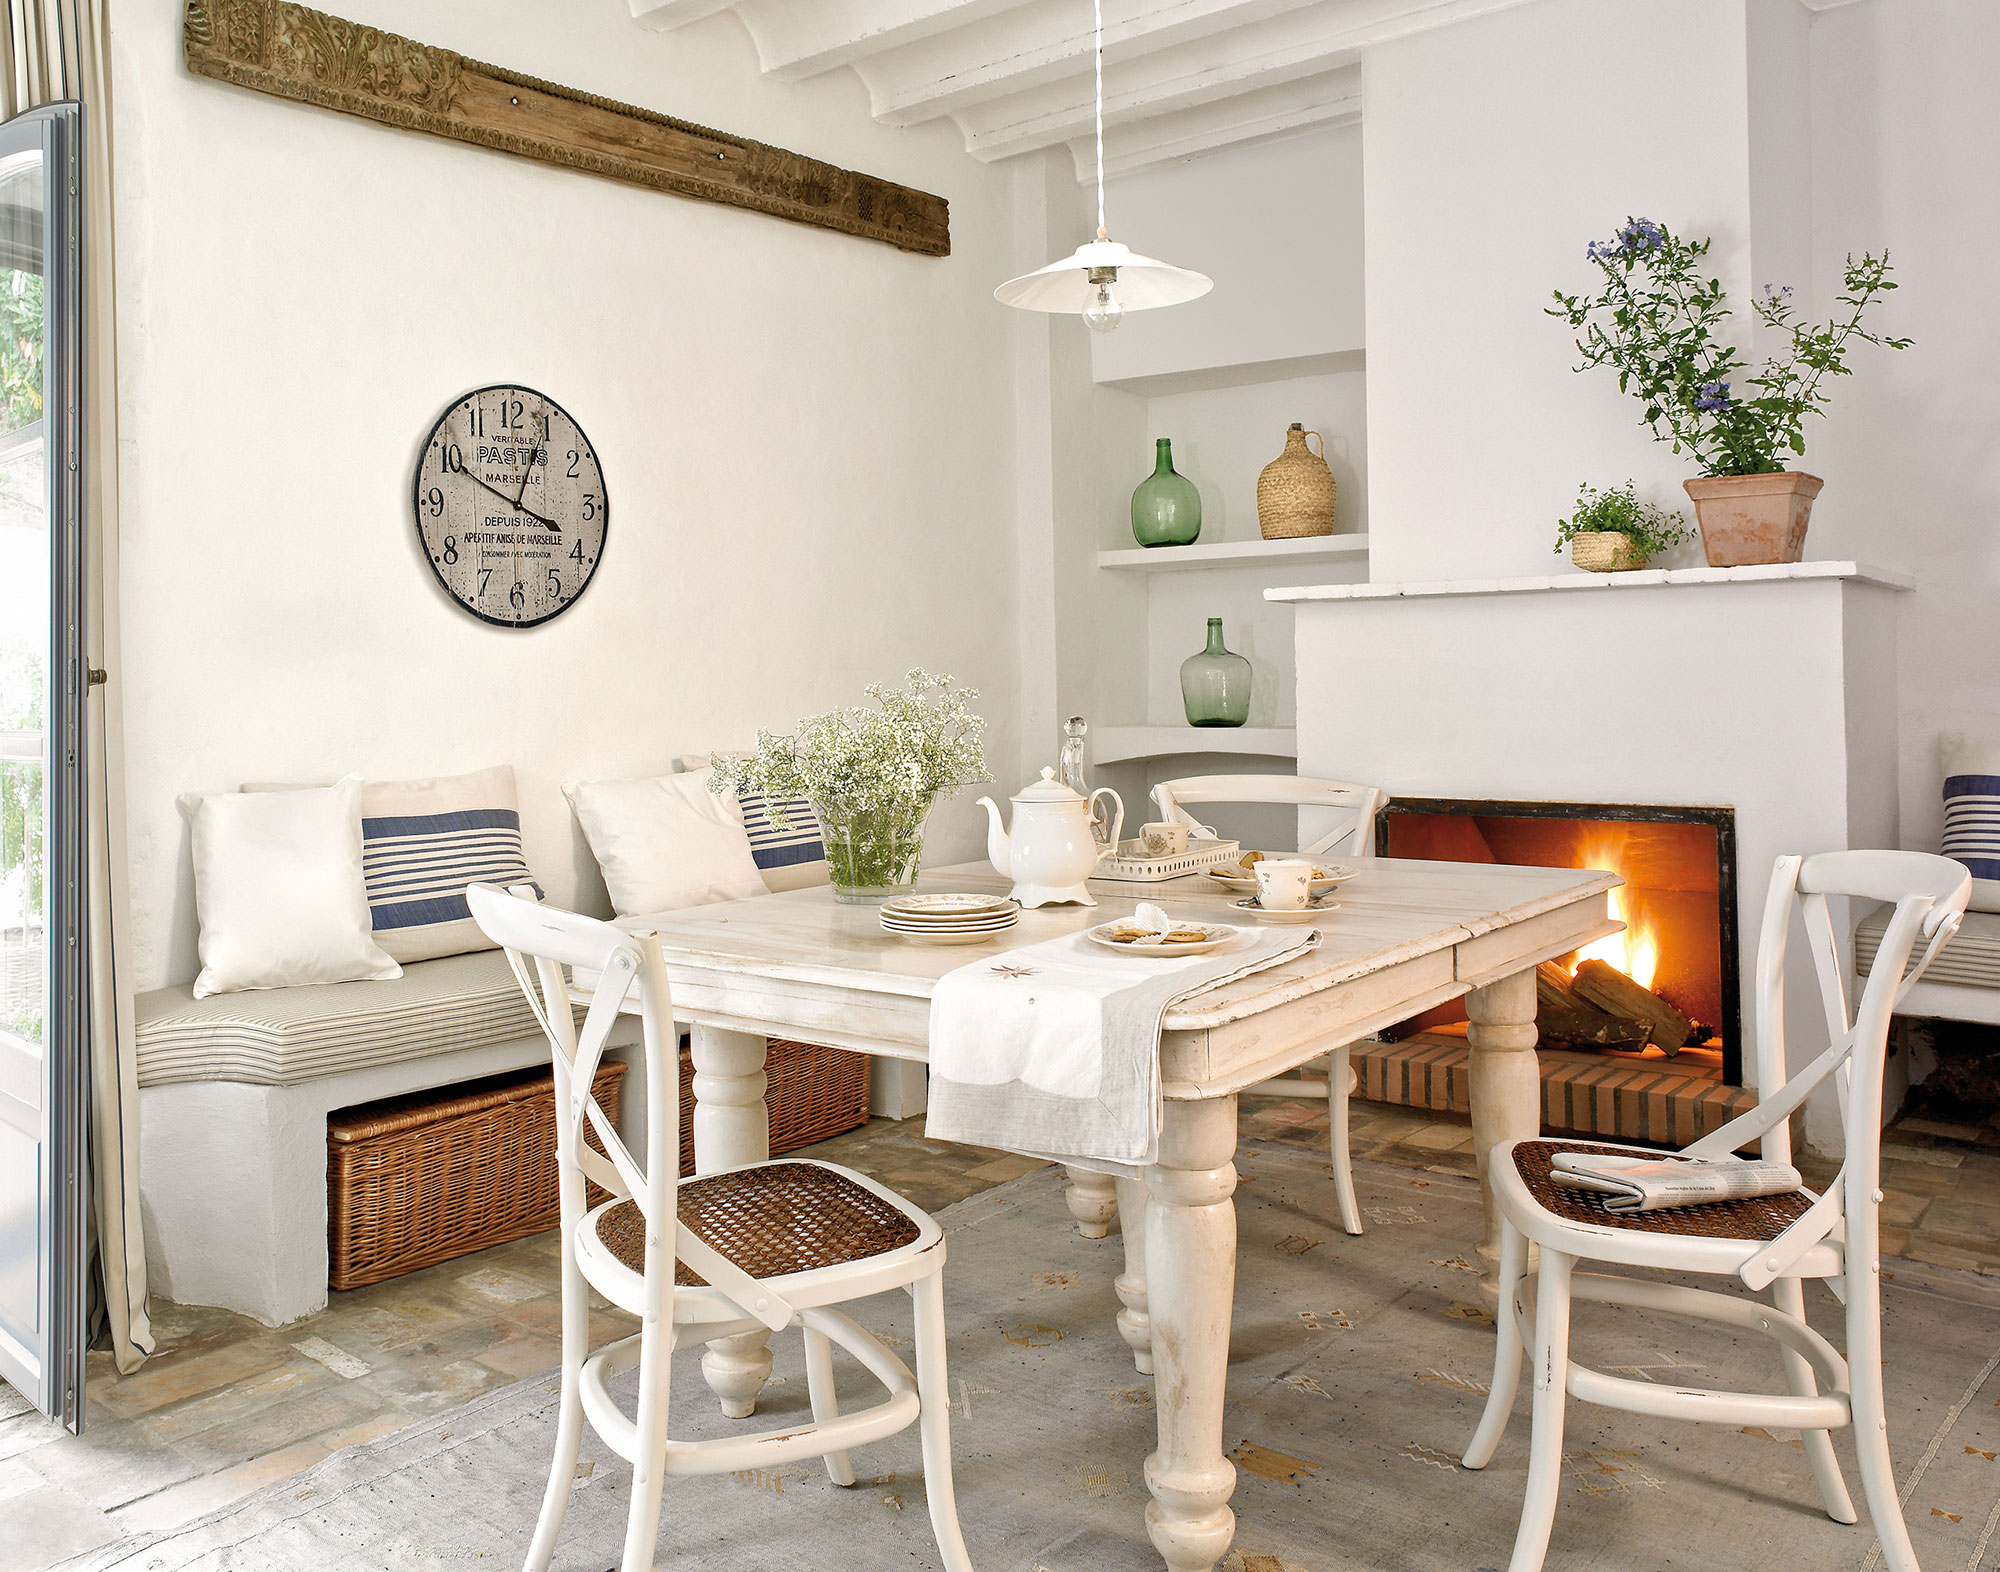 17 offices muy pr cticas para el d a a d a - Cocina rustica blanca ...